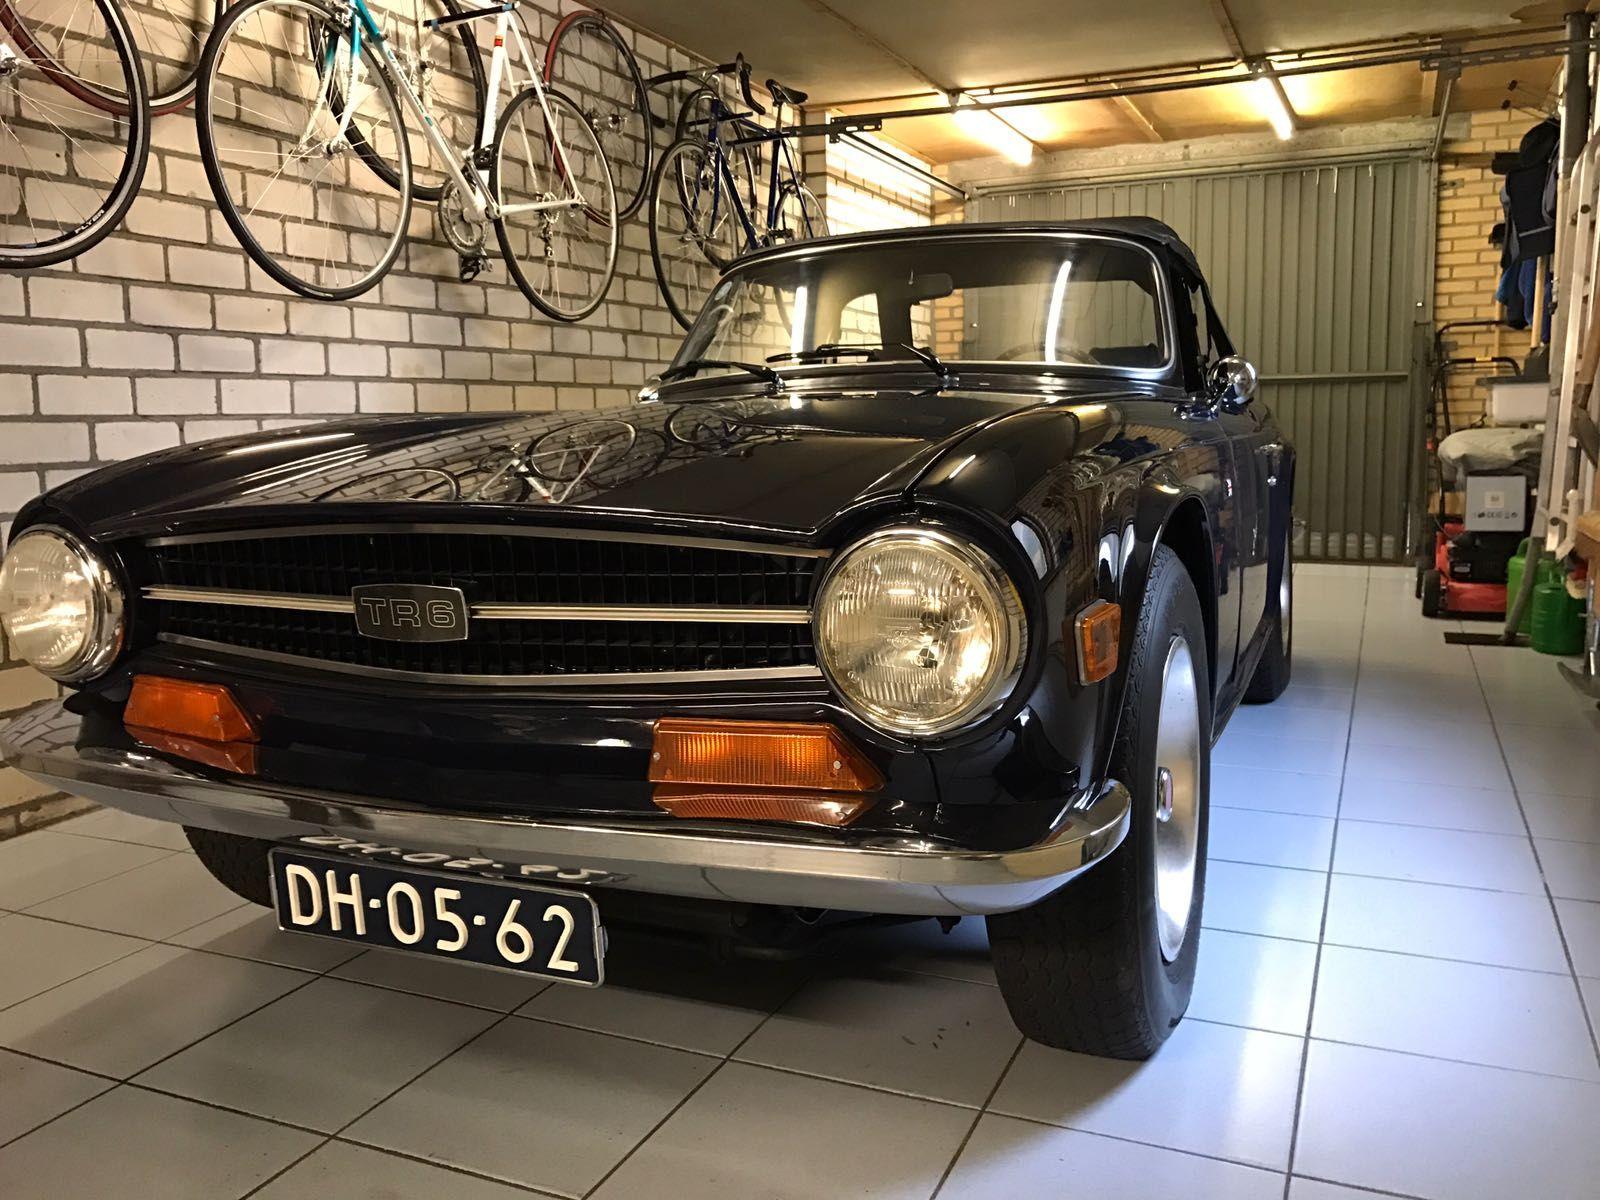 tr6 royal blue | TR6 Inspiration | Antique cars, Cars